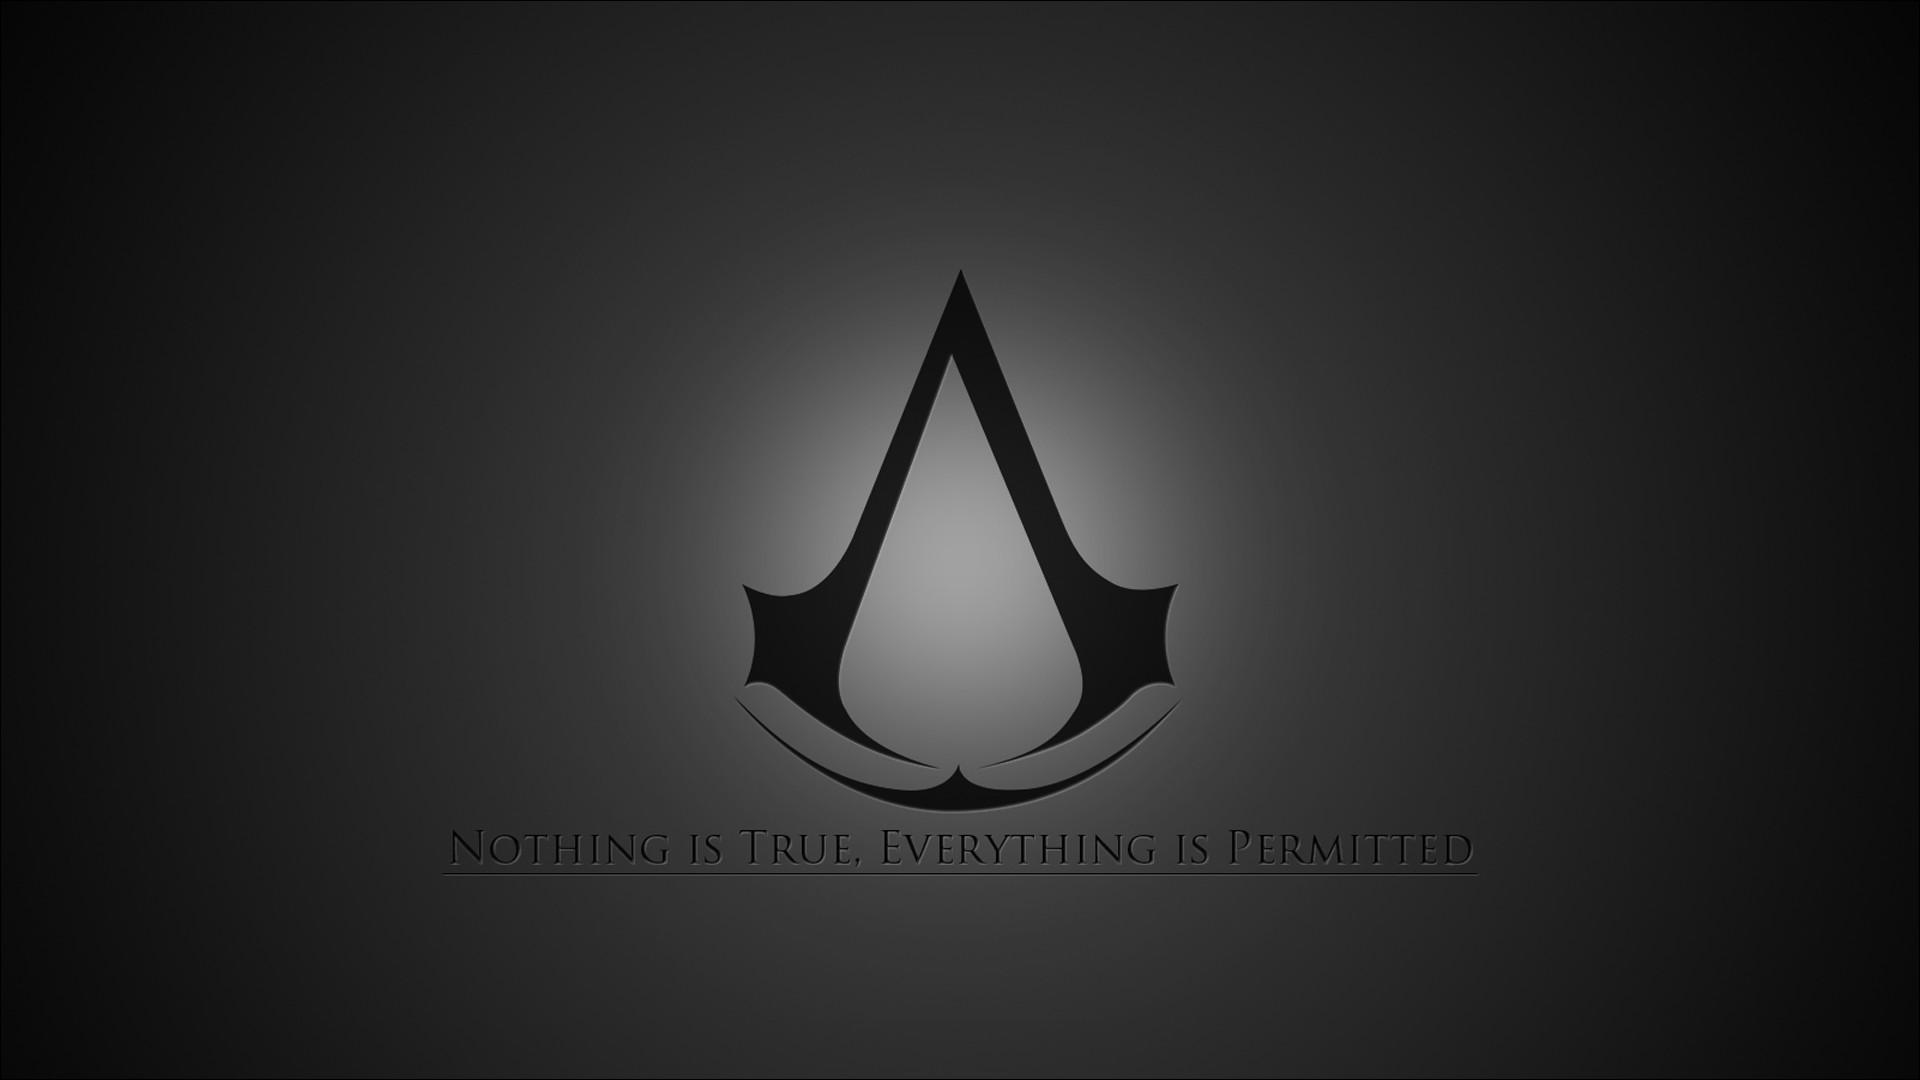 The Assassin's Creed motto wallpaper – 690975